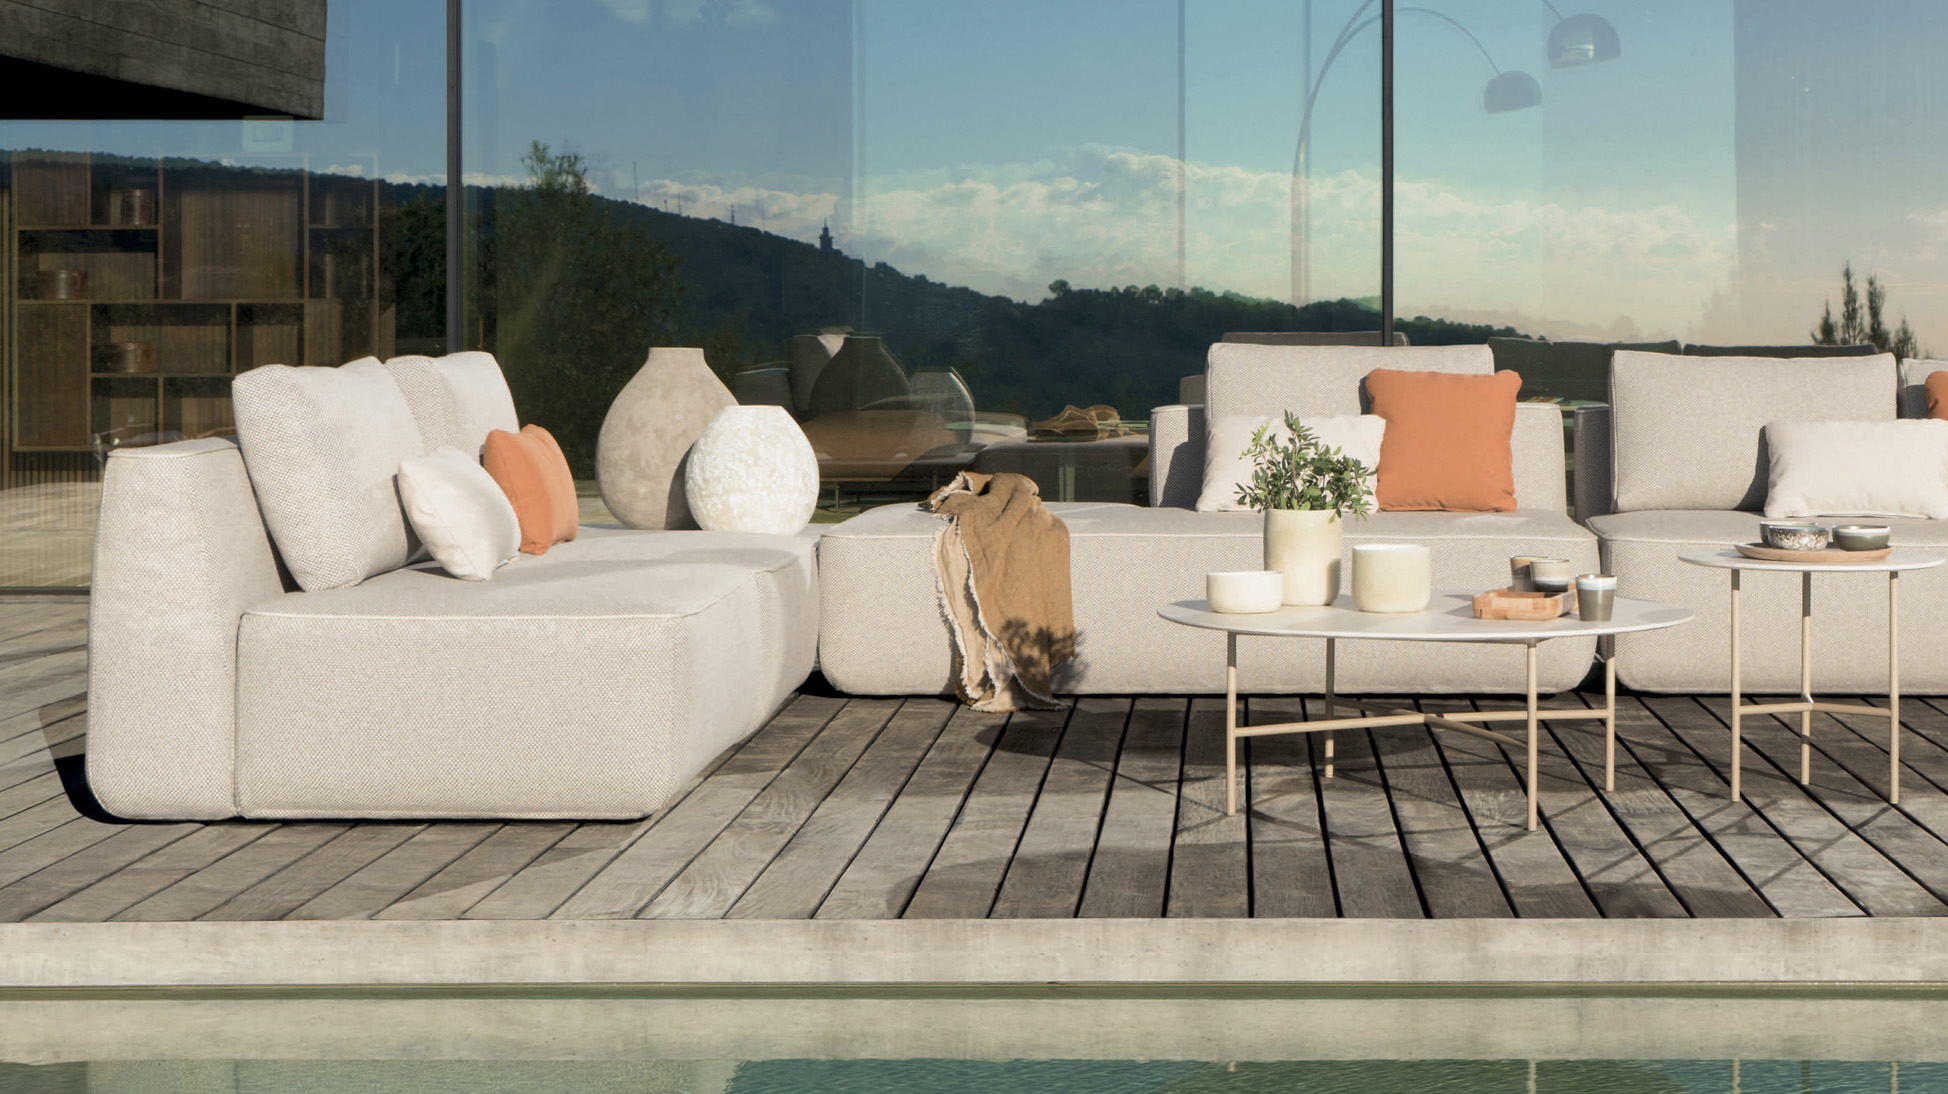 plump-sofa-studio-expormim-furniture-outdoor-0002